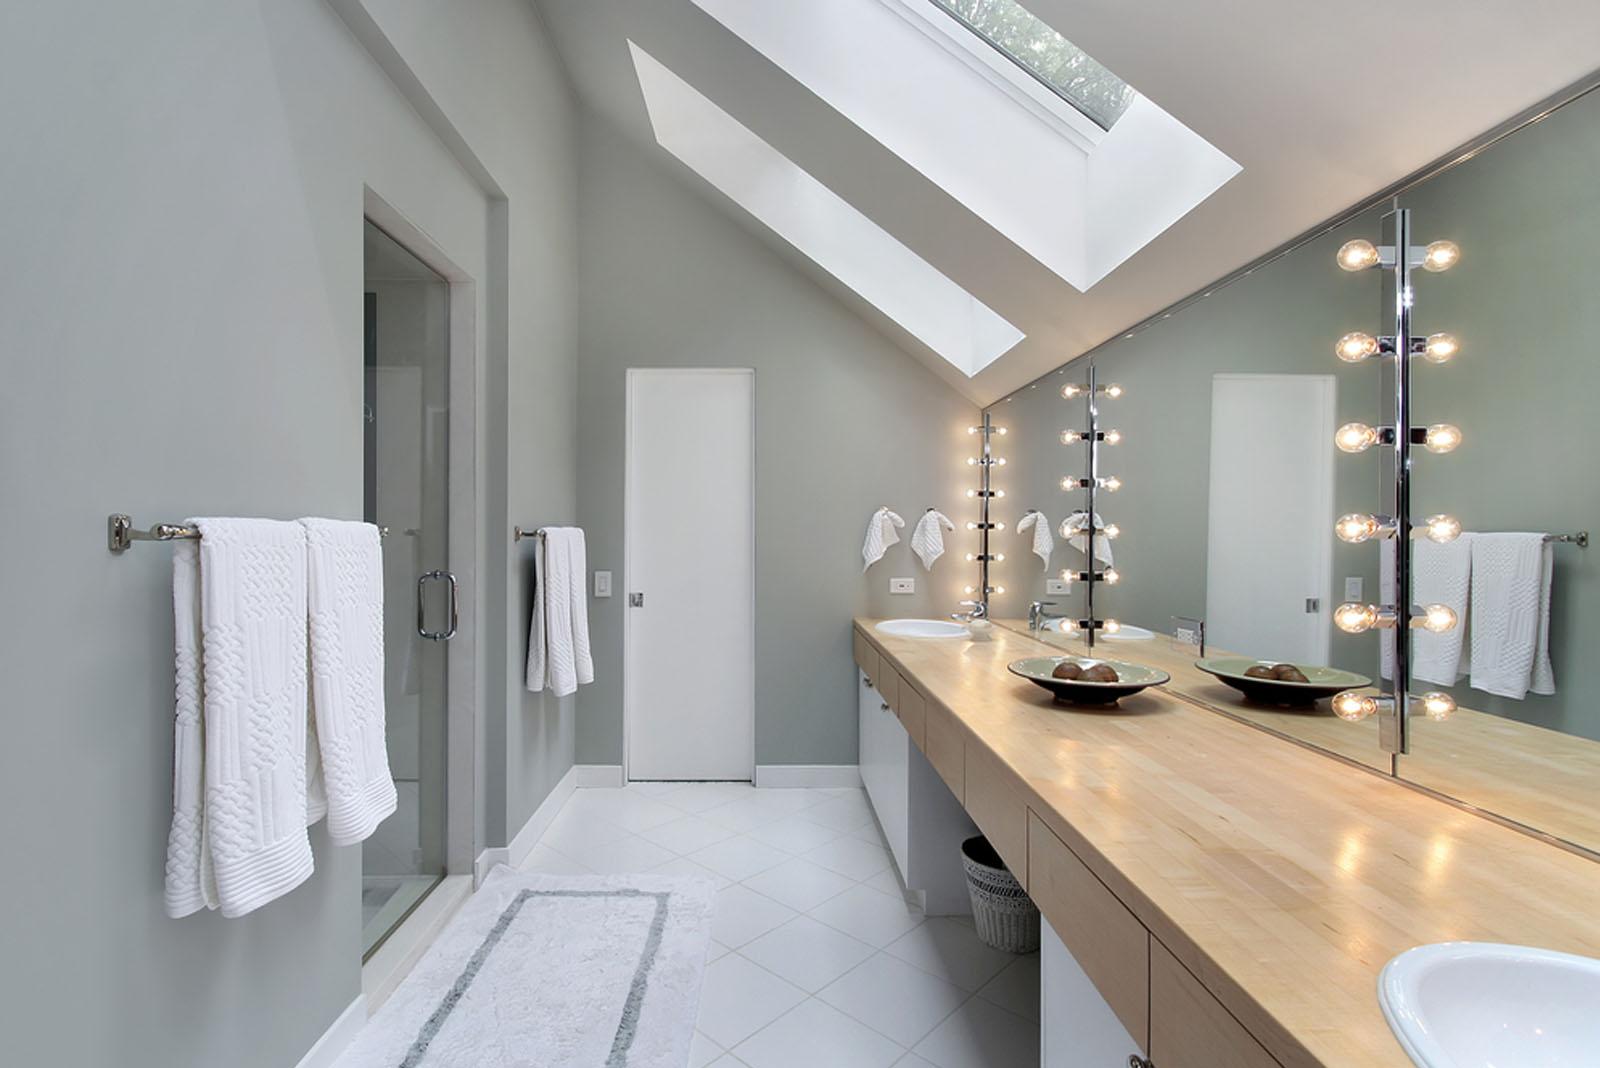 Bathroom design Kincir Bali WP 3